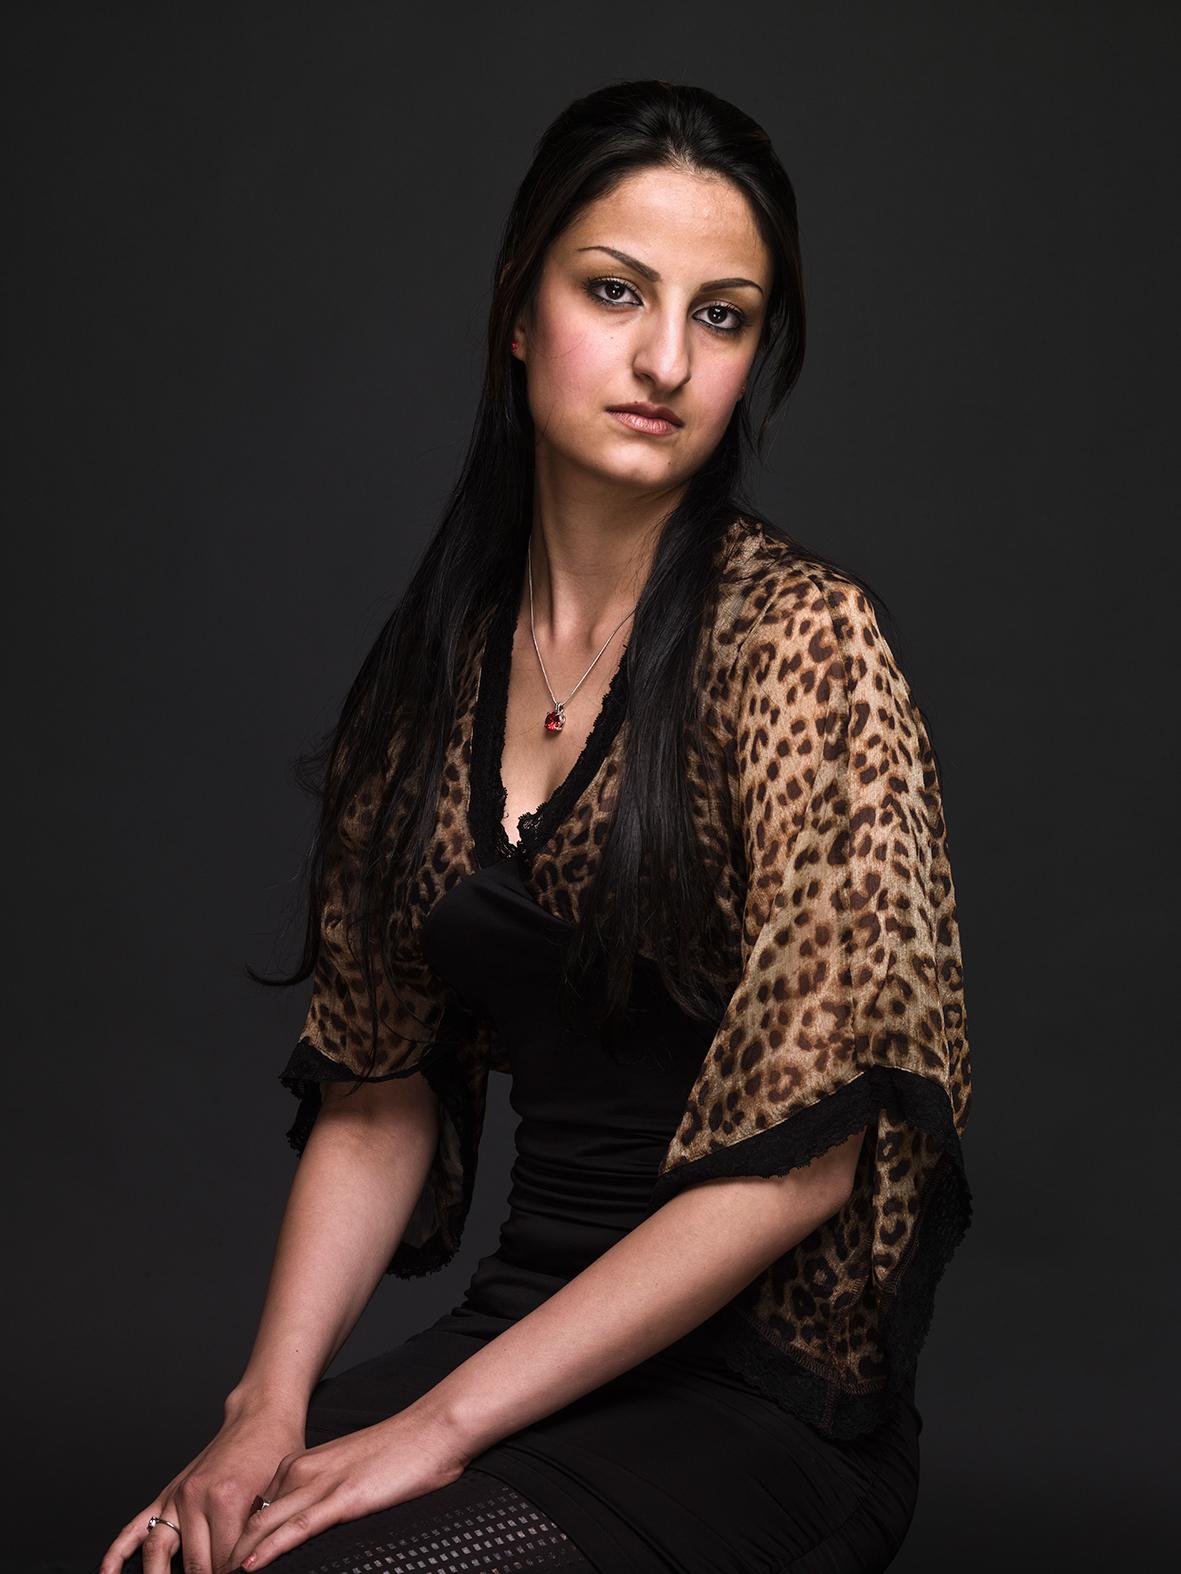 Mozhdeh Firoui, 2011 © Koos Breukel